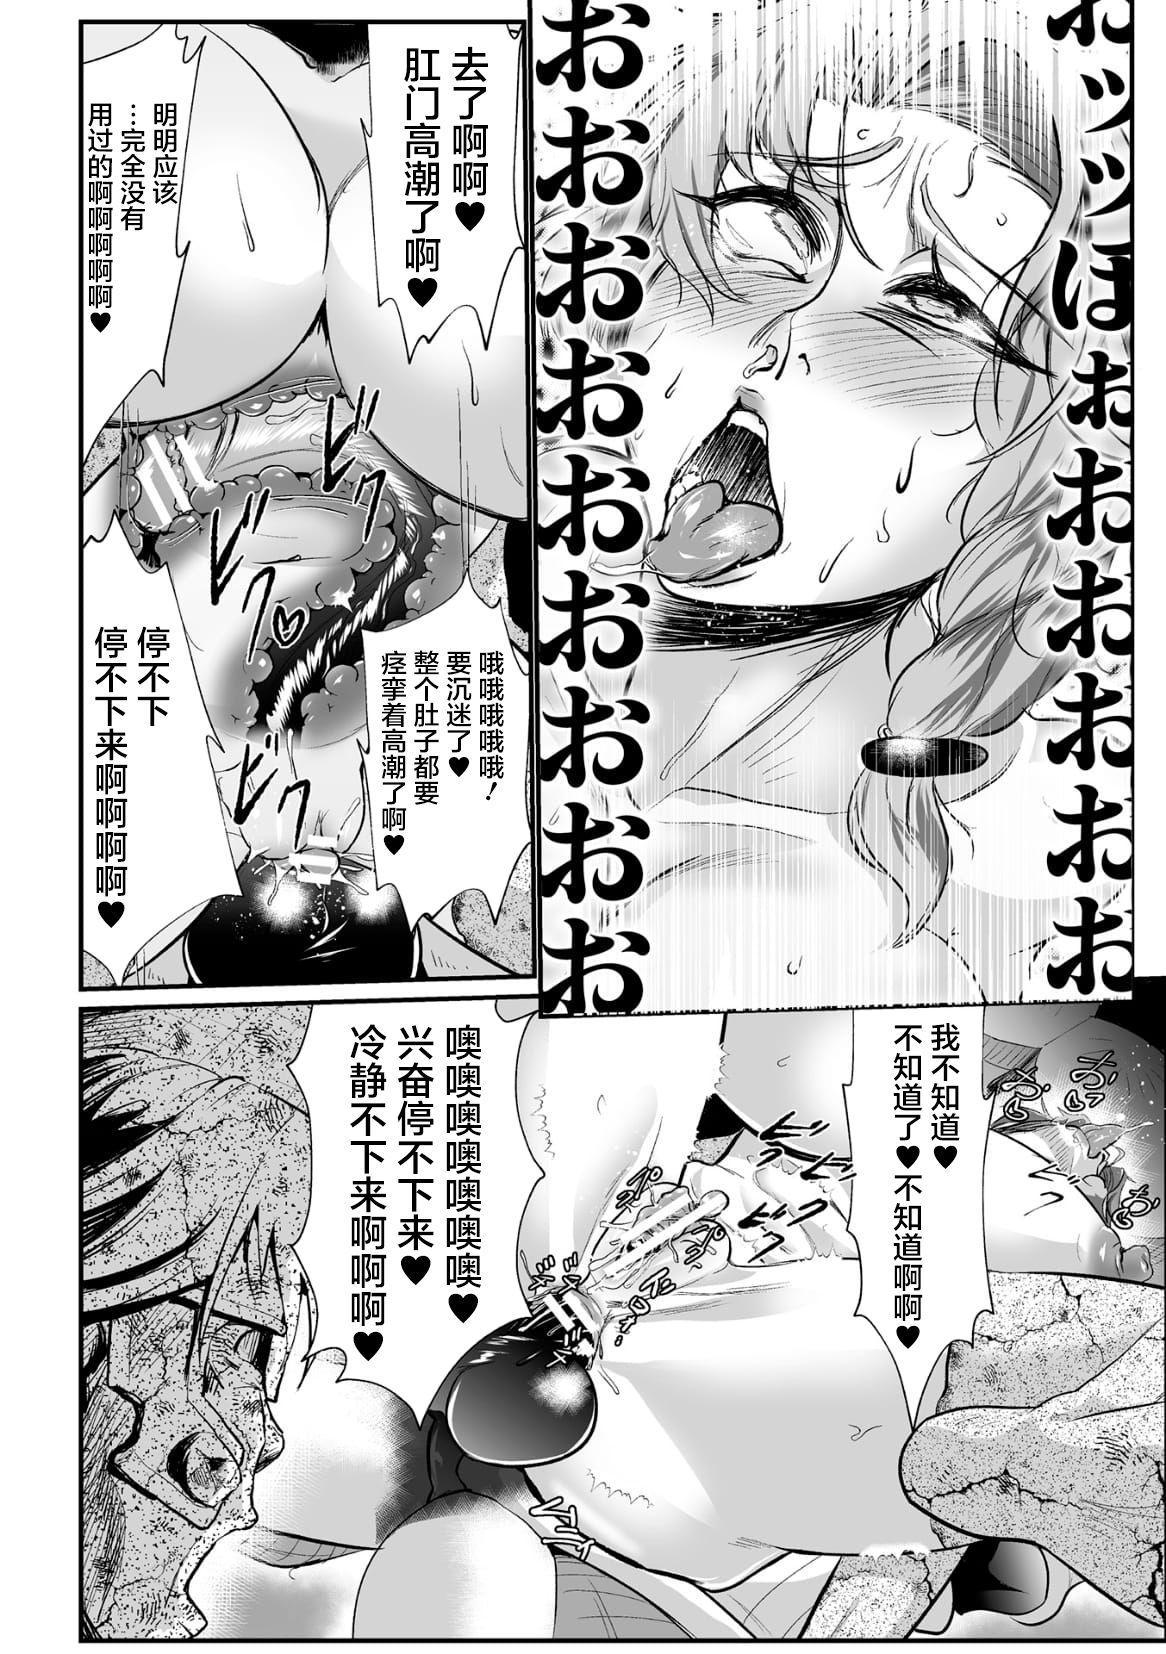 [Mou] Sekkan Fuuin ~Enbi na Sekizou ni Otosareshi Yuusha Ichizoku~ Ch. 1 [Chinese] [不咕鸟汉化组] 23